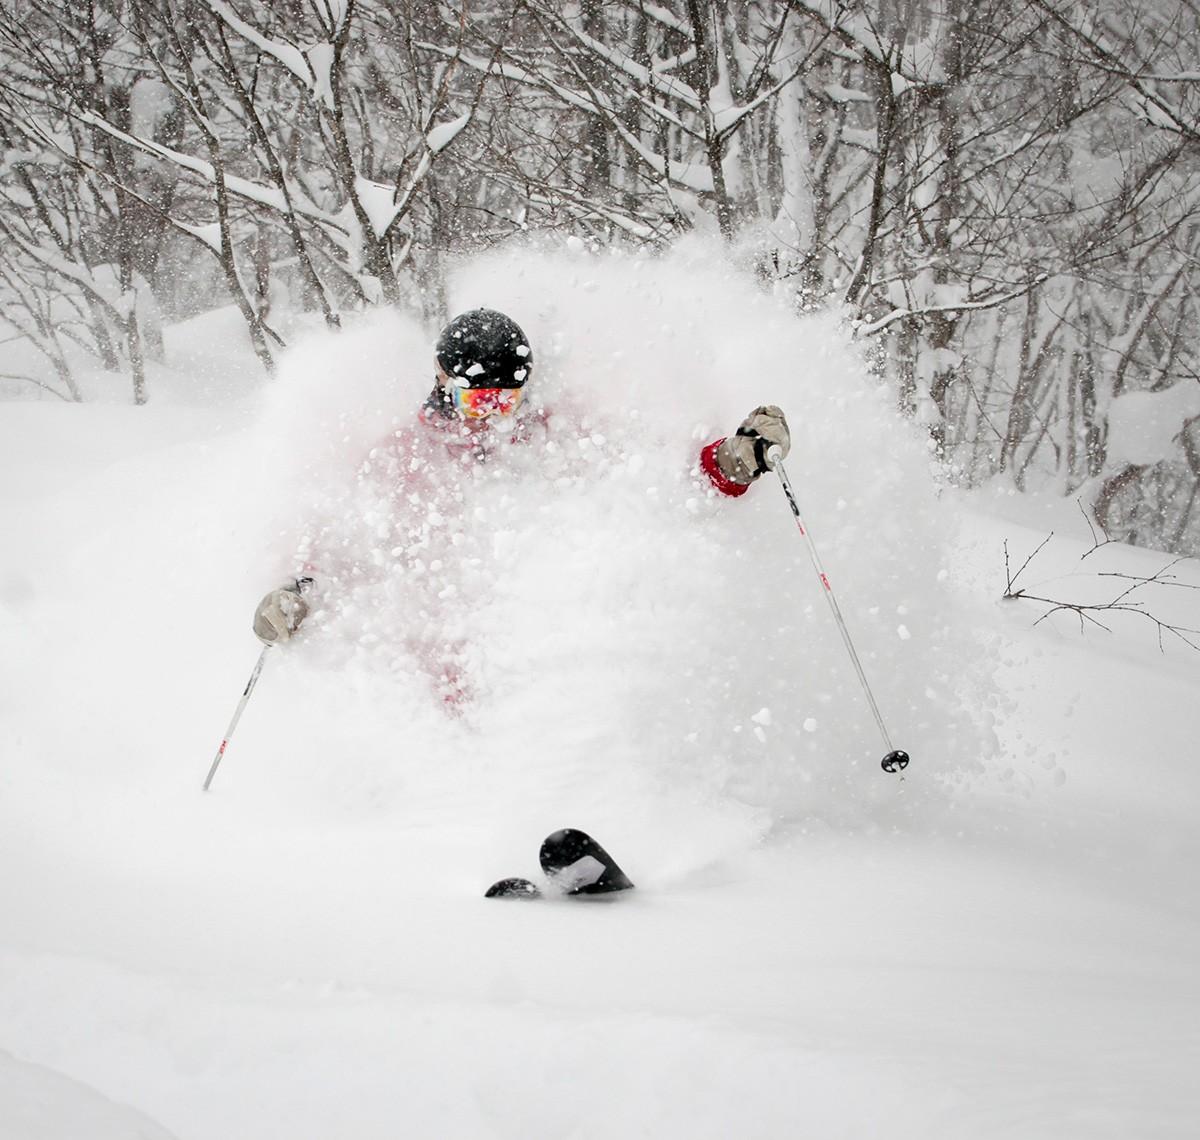 SSS-Level-1200w-x-1140h Adult (15+) Group Ski & Snowboard Programs